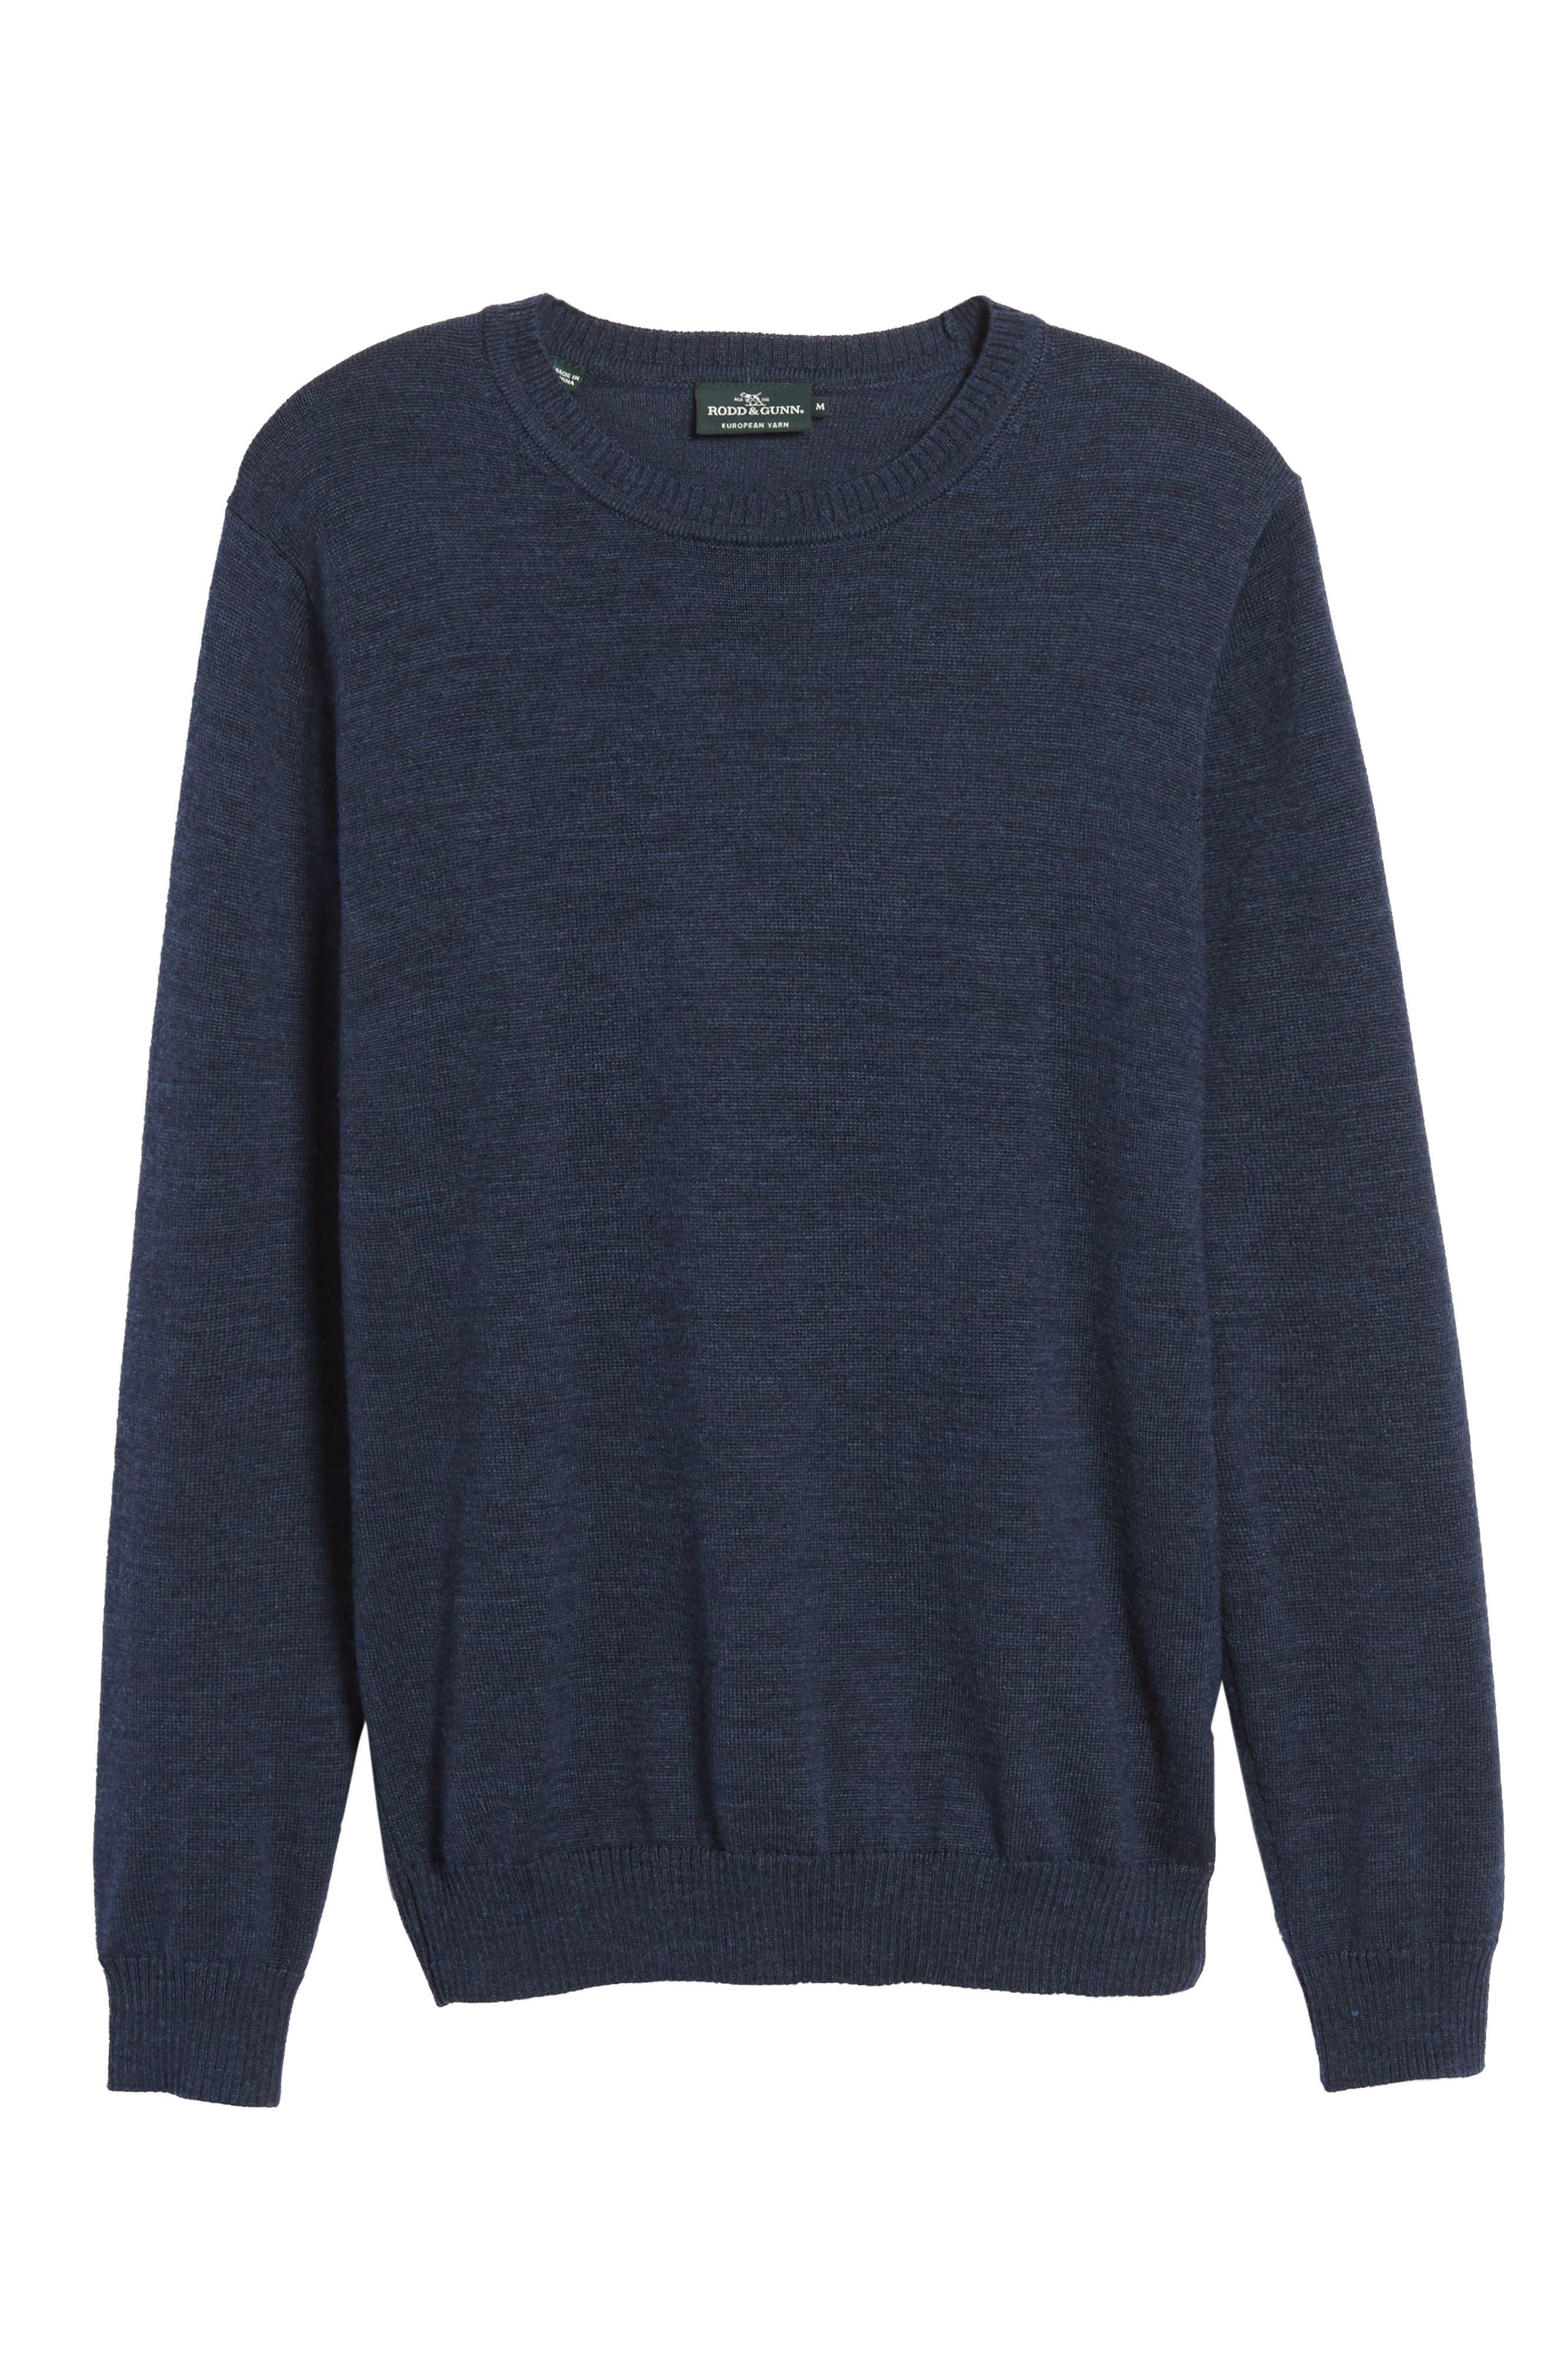 Bannockburn Mélange Merino Wool Sweater,                             Alternate thumbnail 6, color,                             Ink